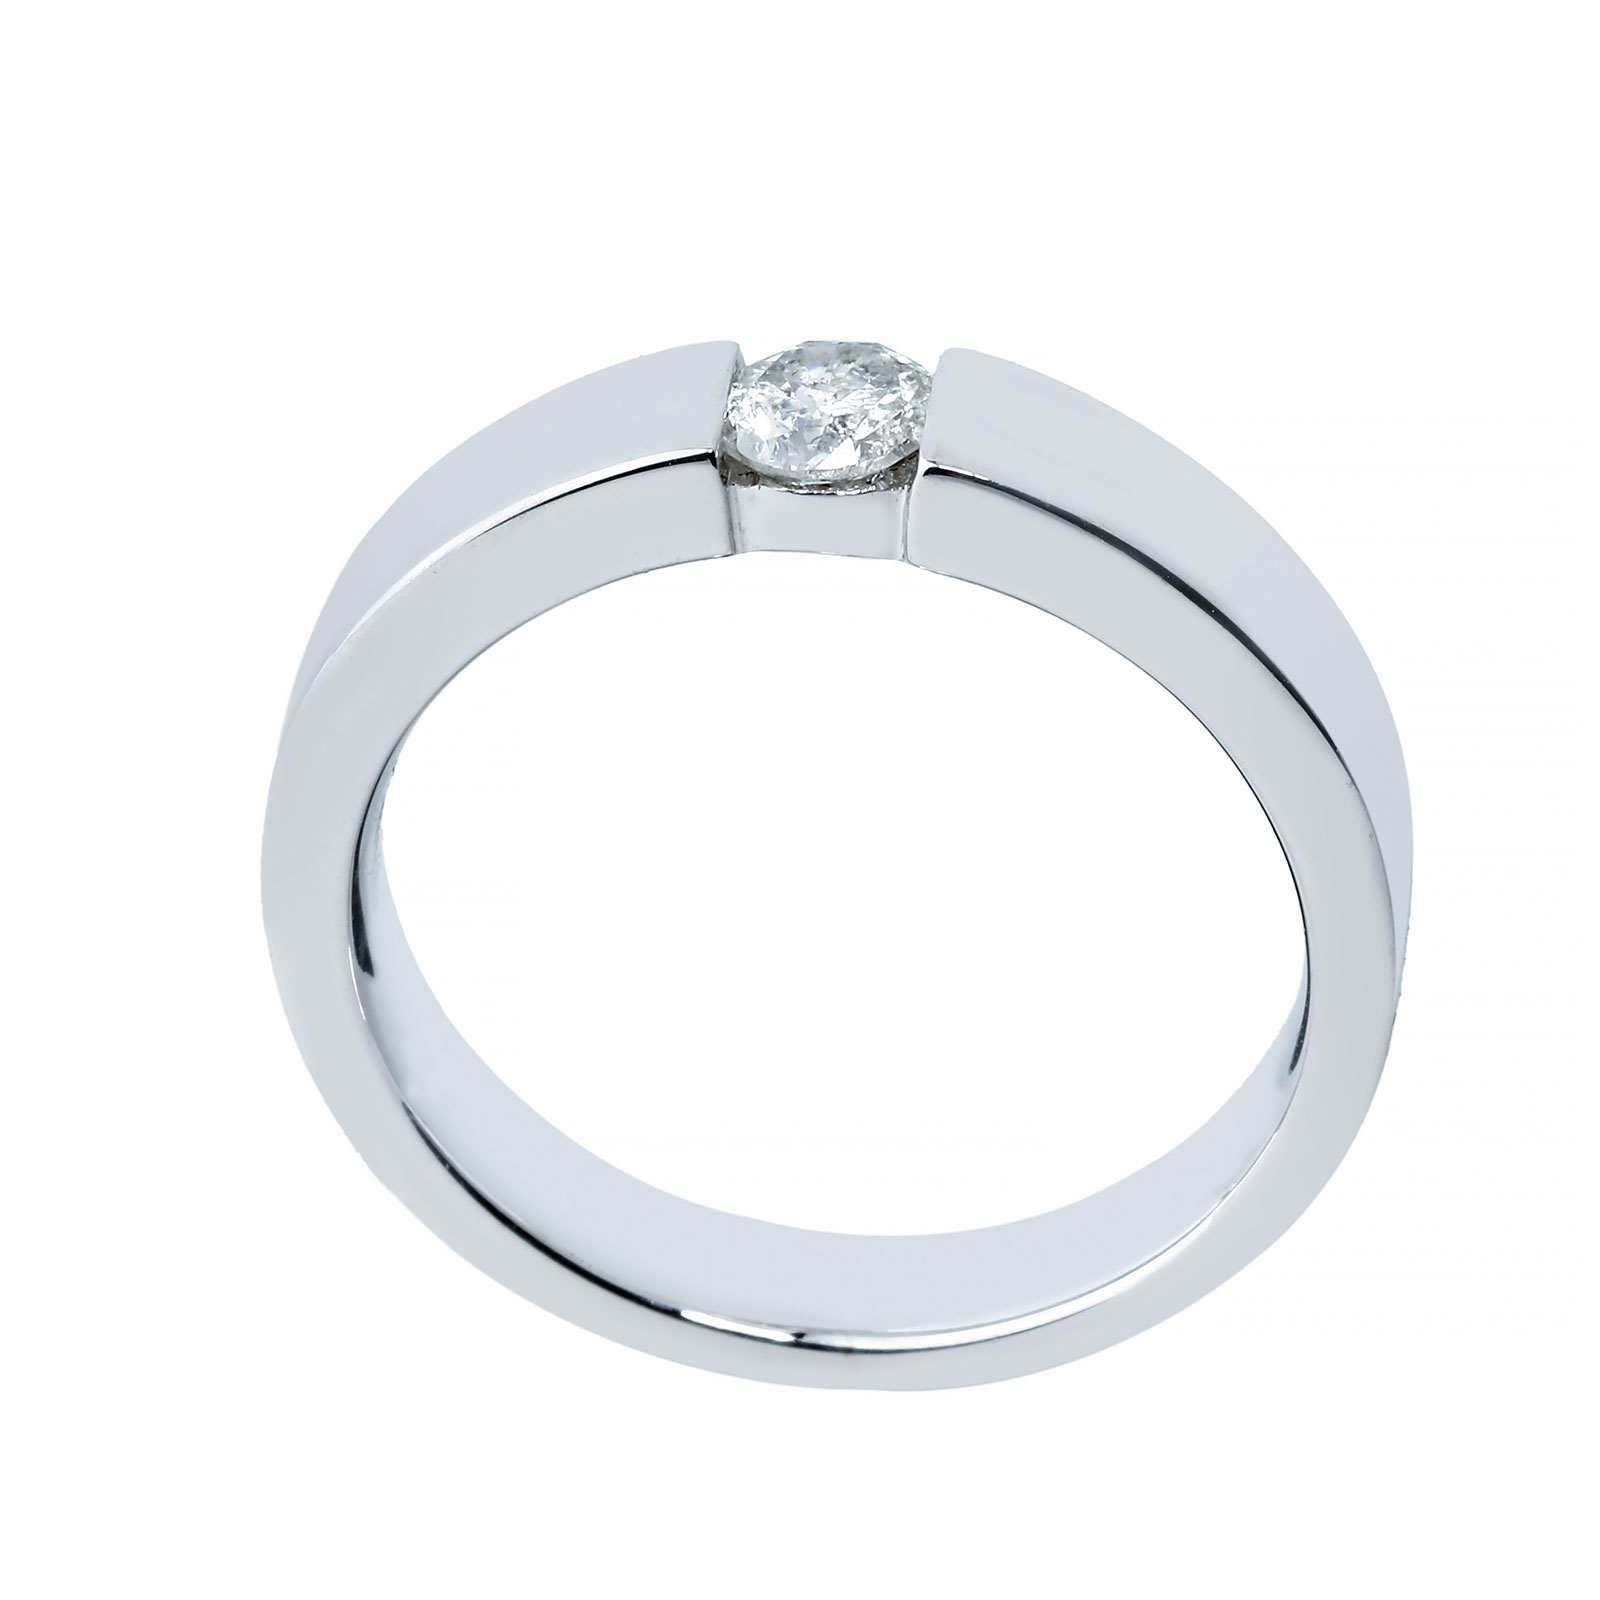 حلقه برليان 80175 C گوهربين goharbin